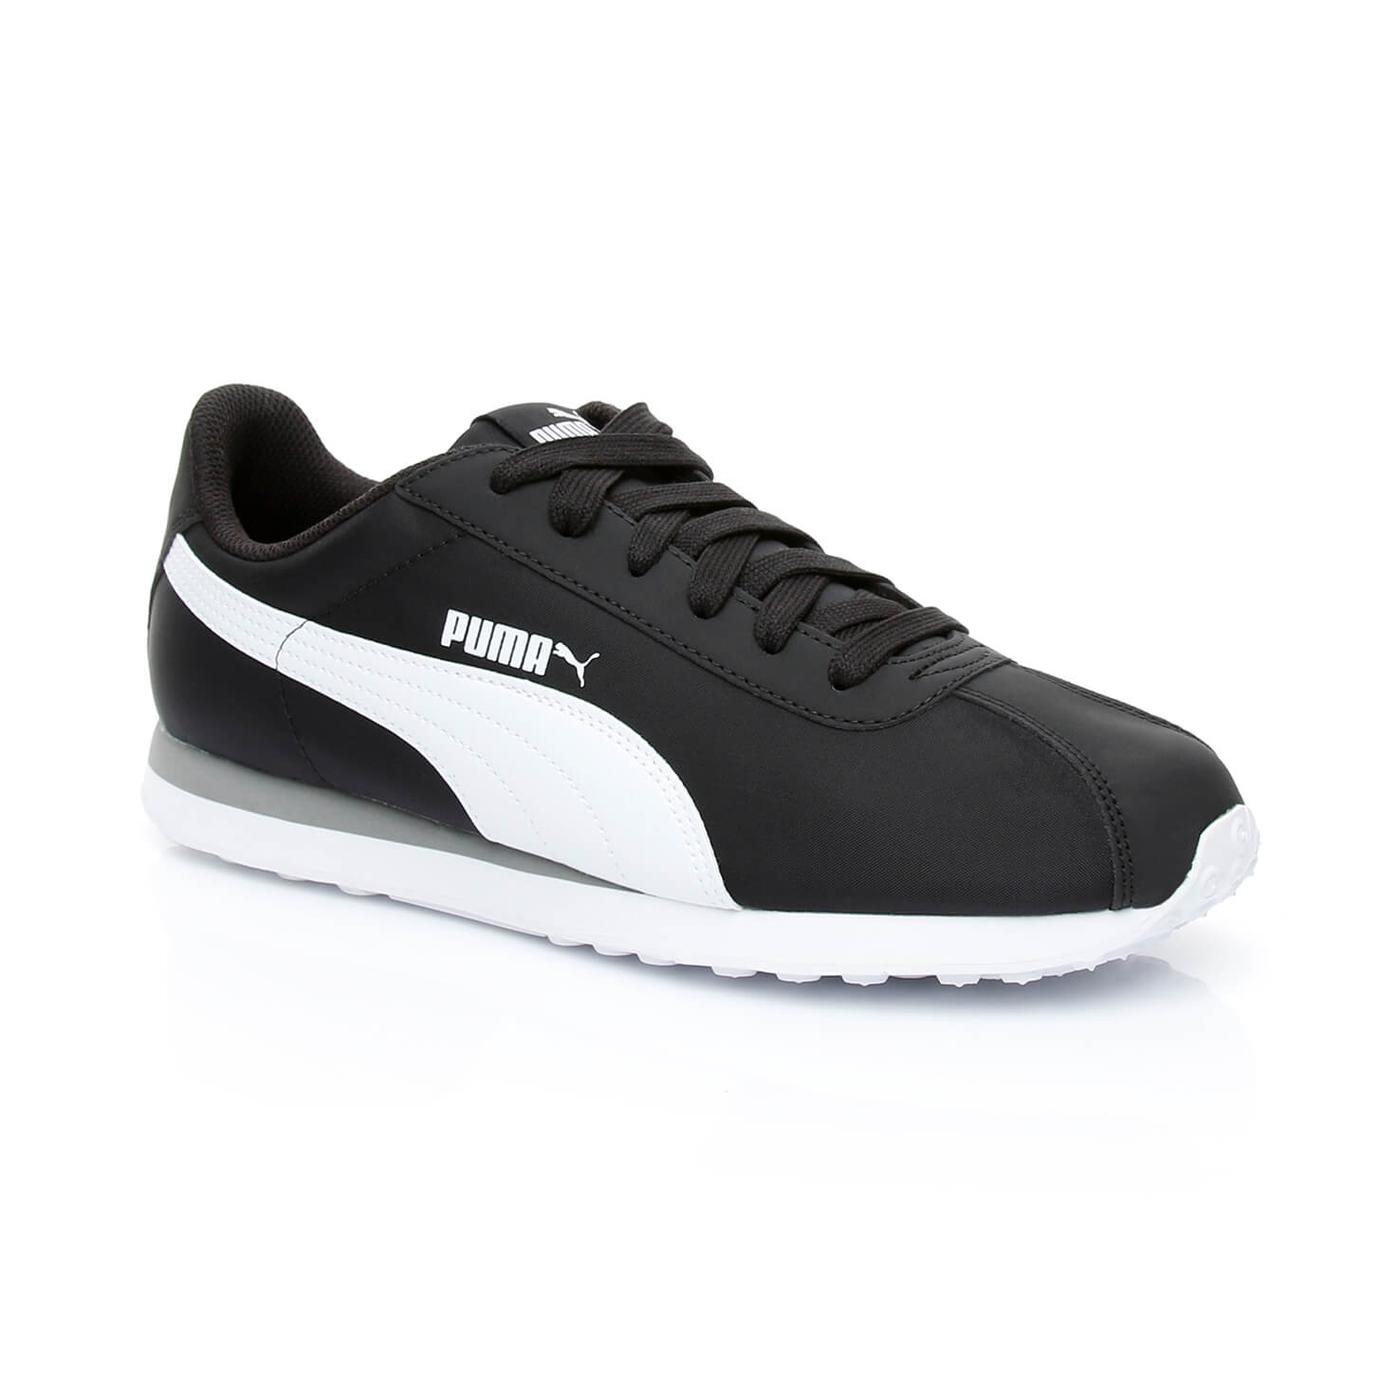 Puma Turin Nl Siyah Erkek Sneaker